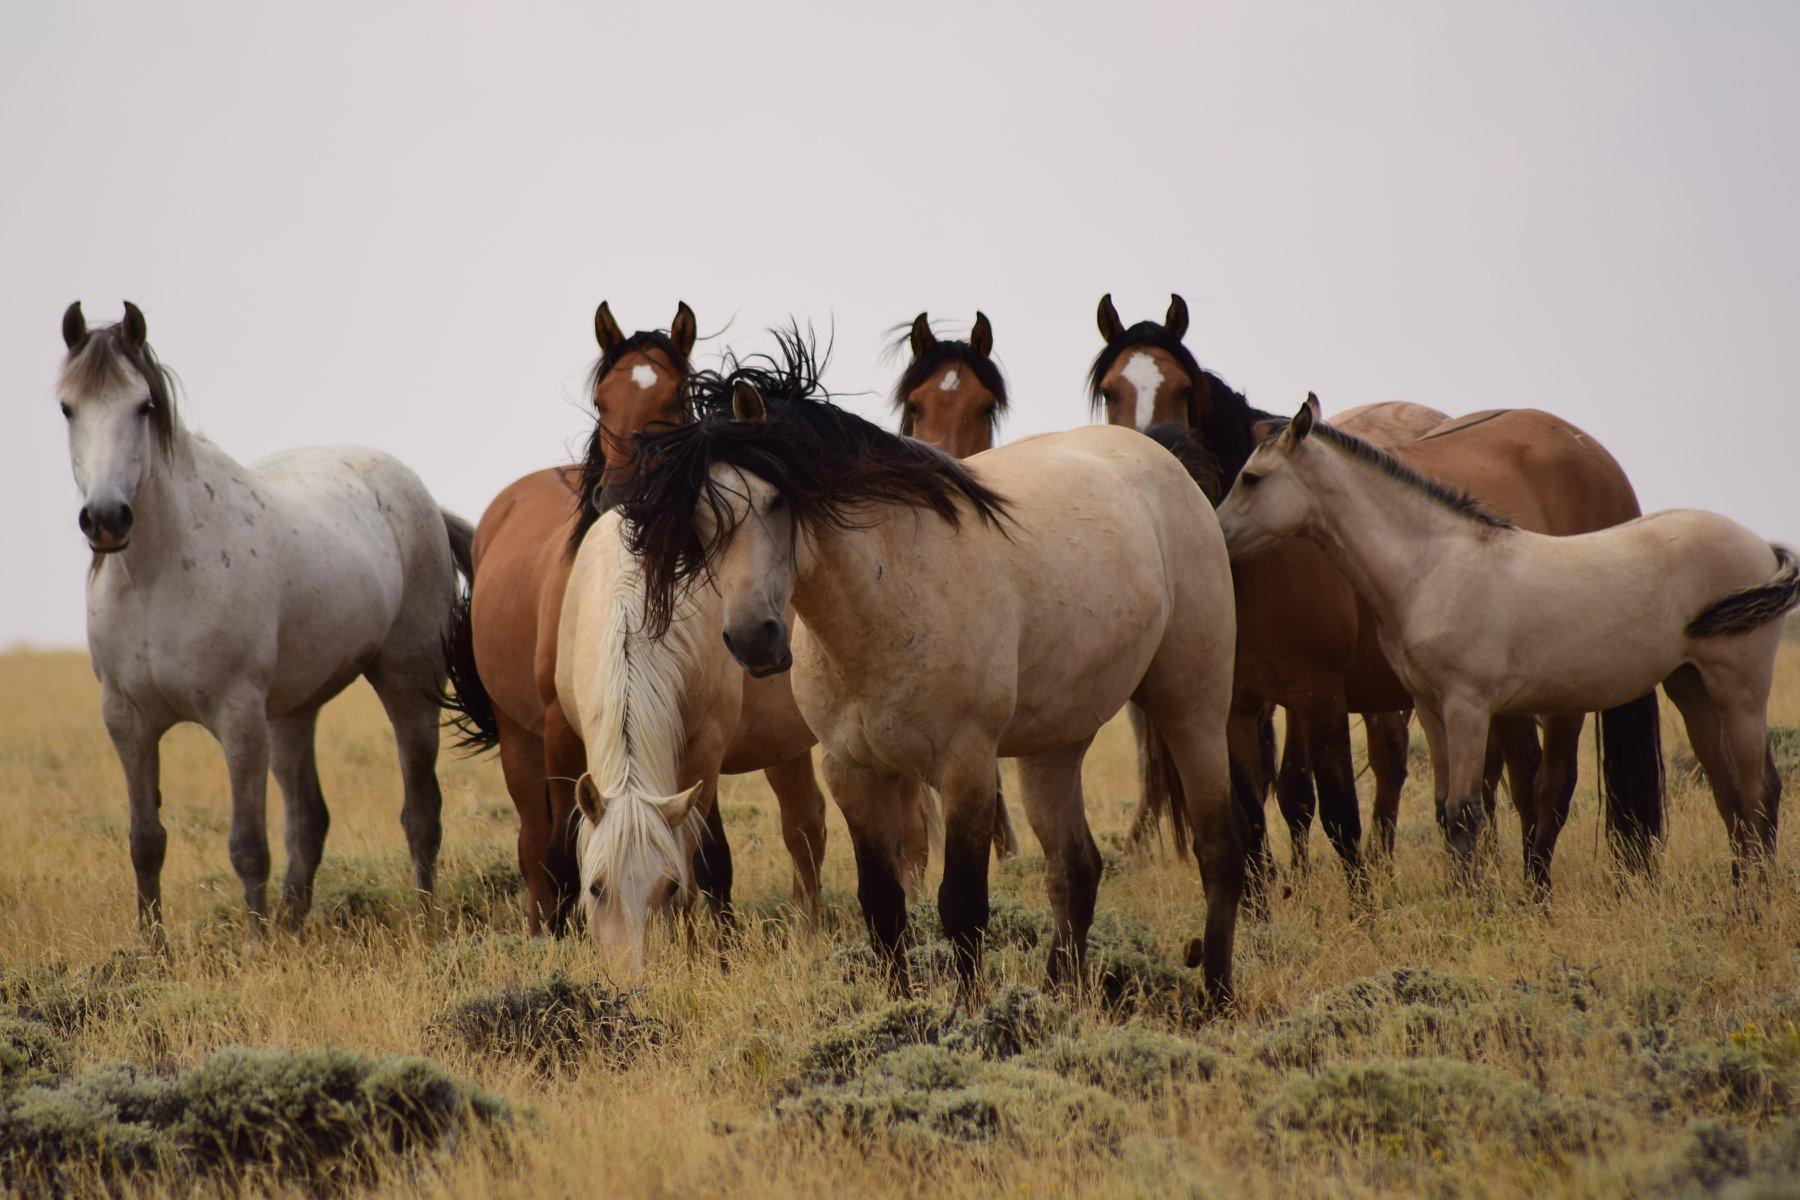 Reward Offered for Info on Wild Horses Killed in the Red Desert